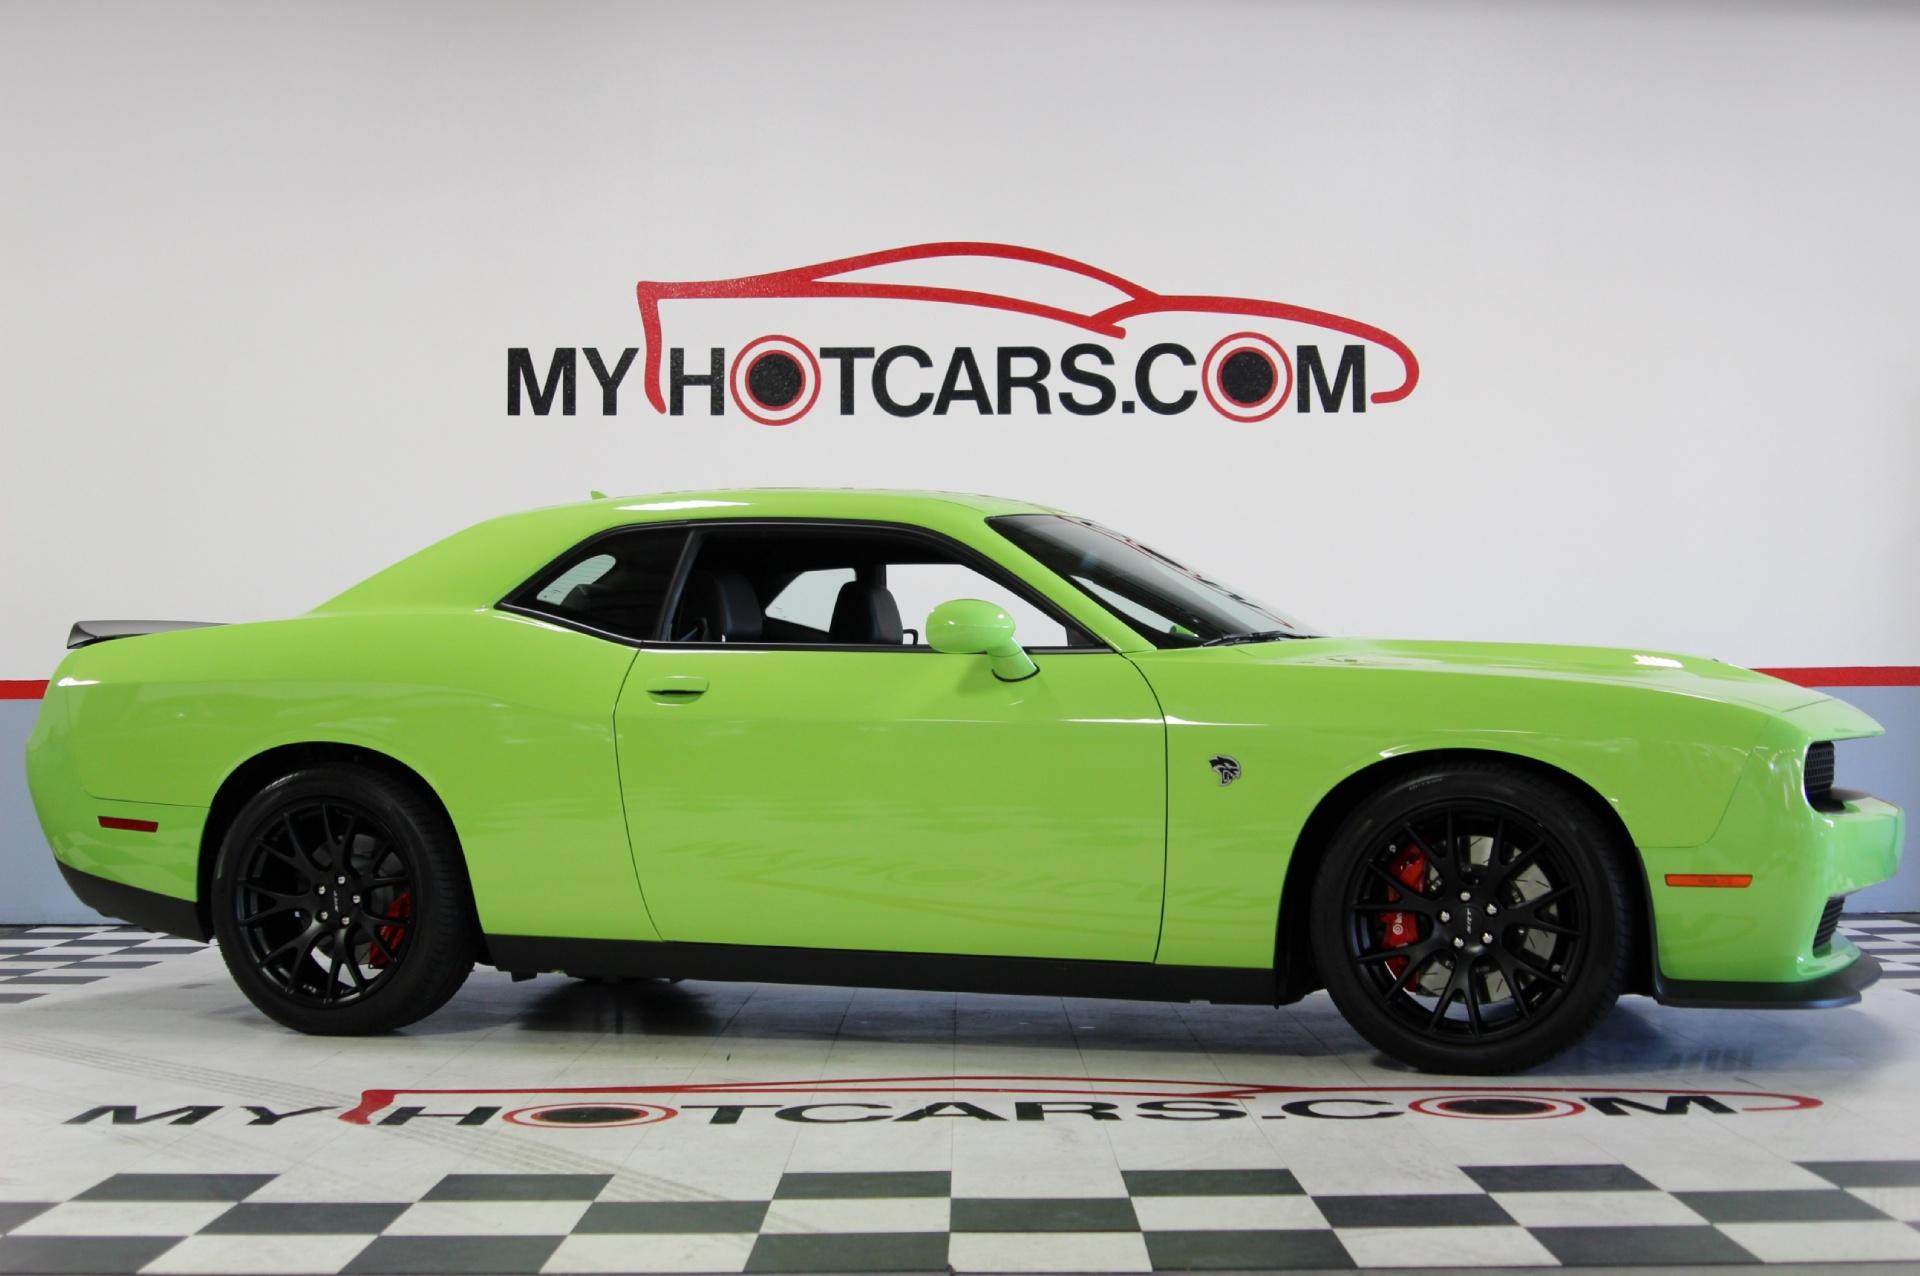 2015 Dodge Challenger SRT Hellcat Stock for sale near San